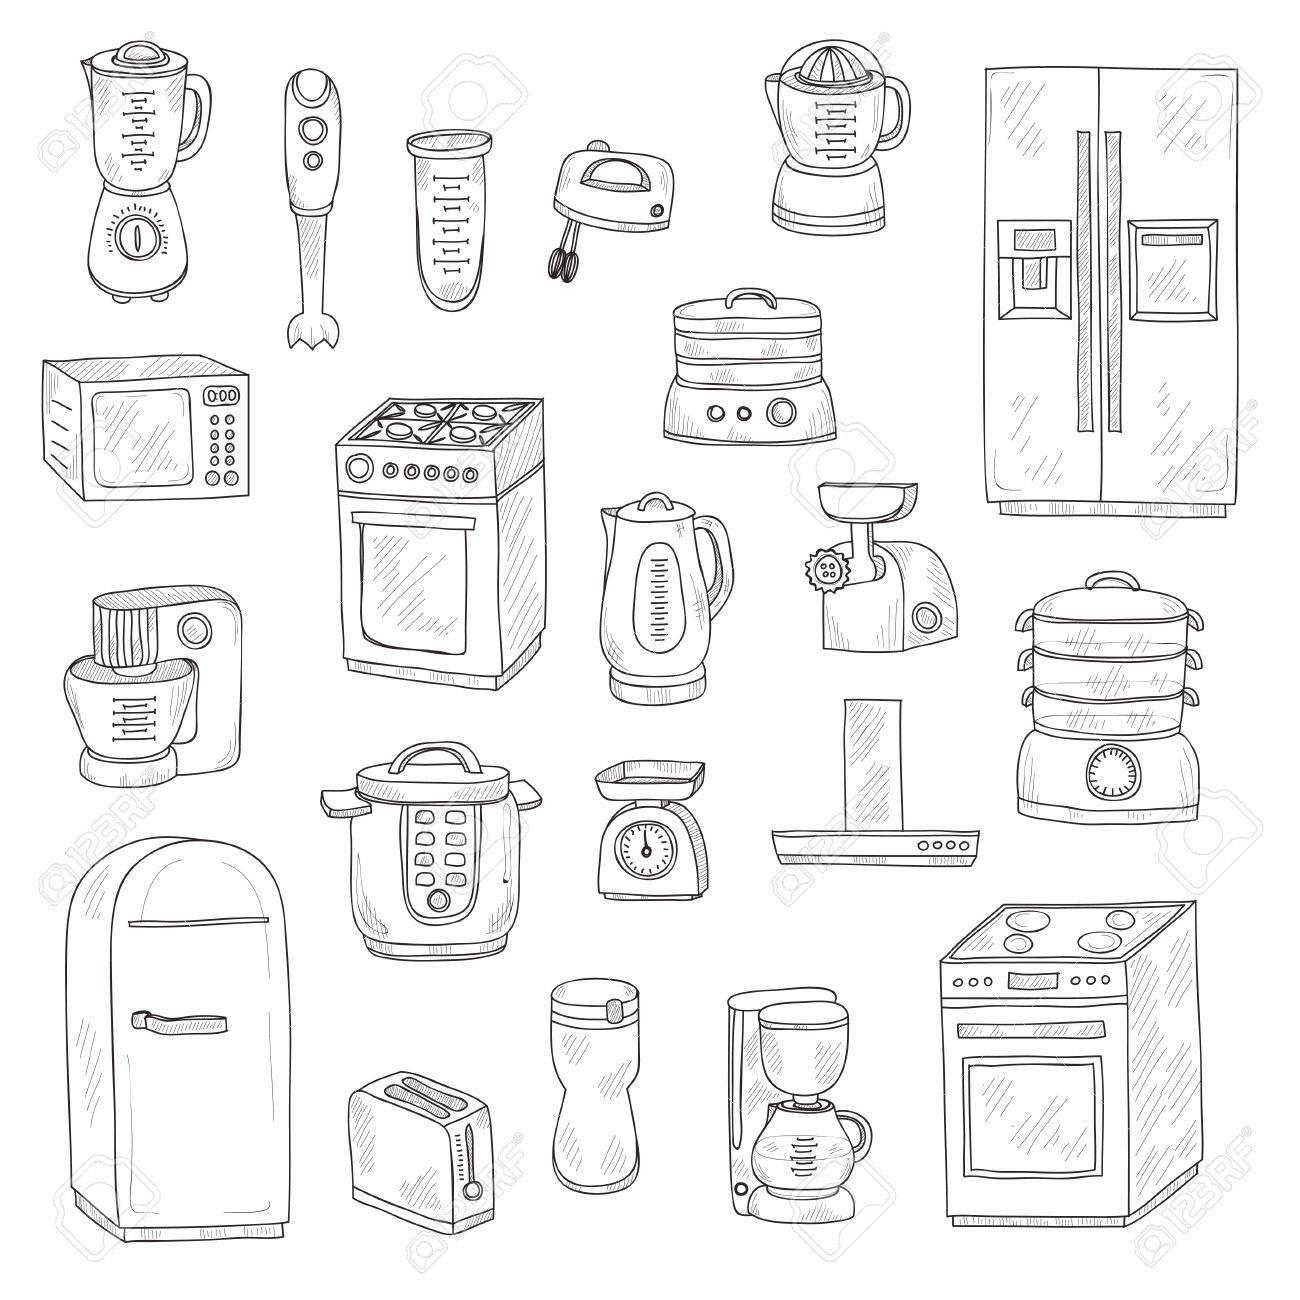 Set Nette Kuchengerate Kuche Sammlung Lizenzfrei Nutzbare Vektorgrafiken Clip Arts Illustrationen Image 53168860